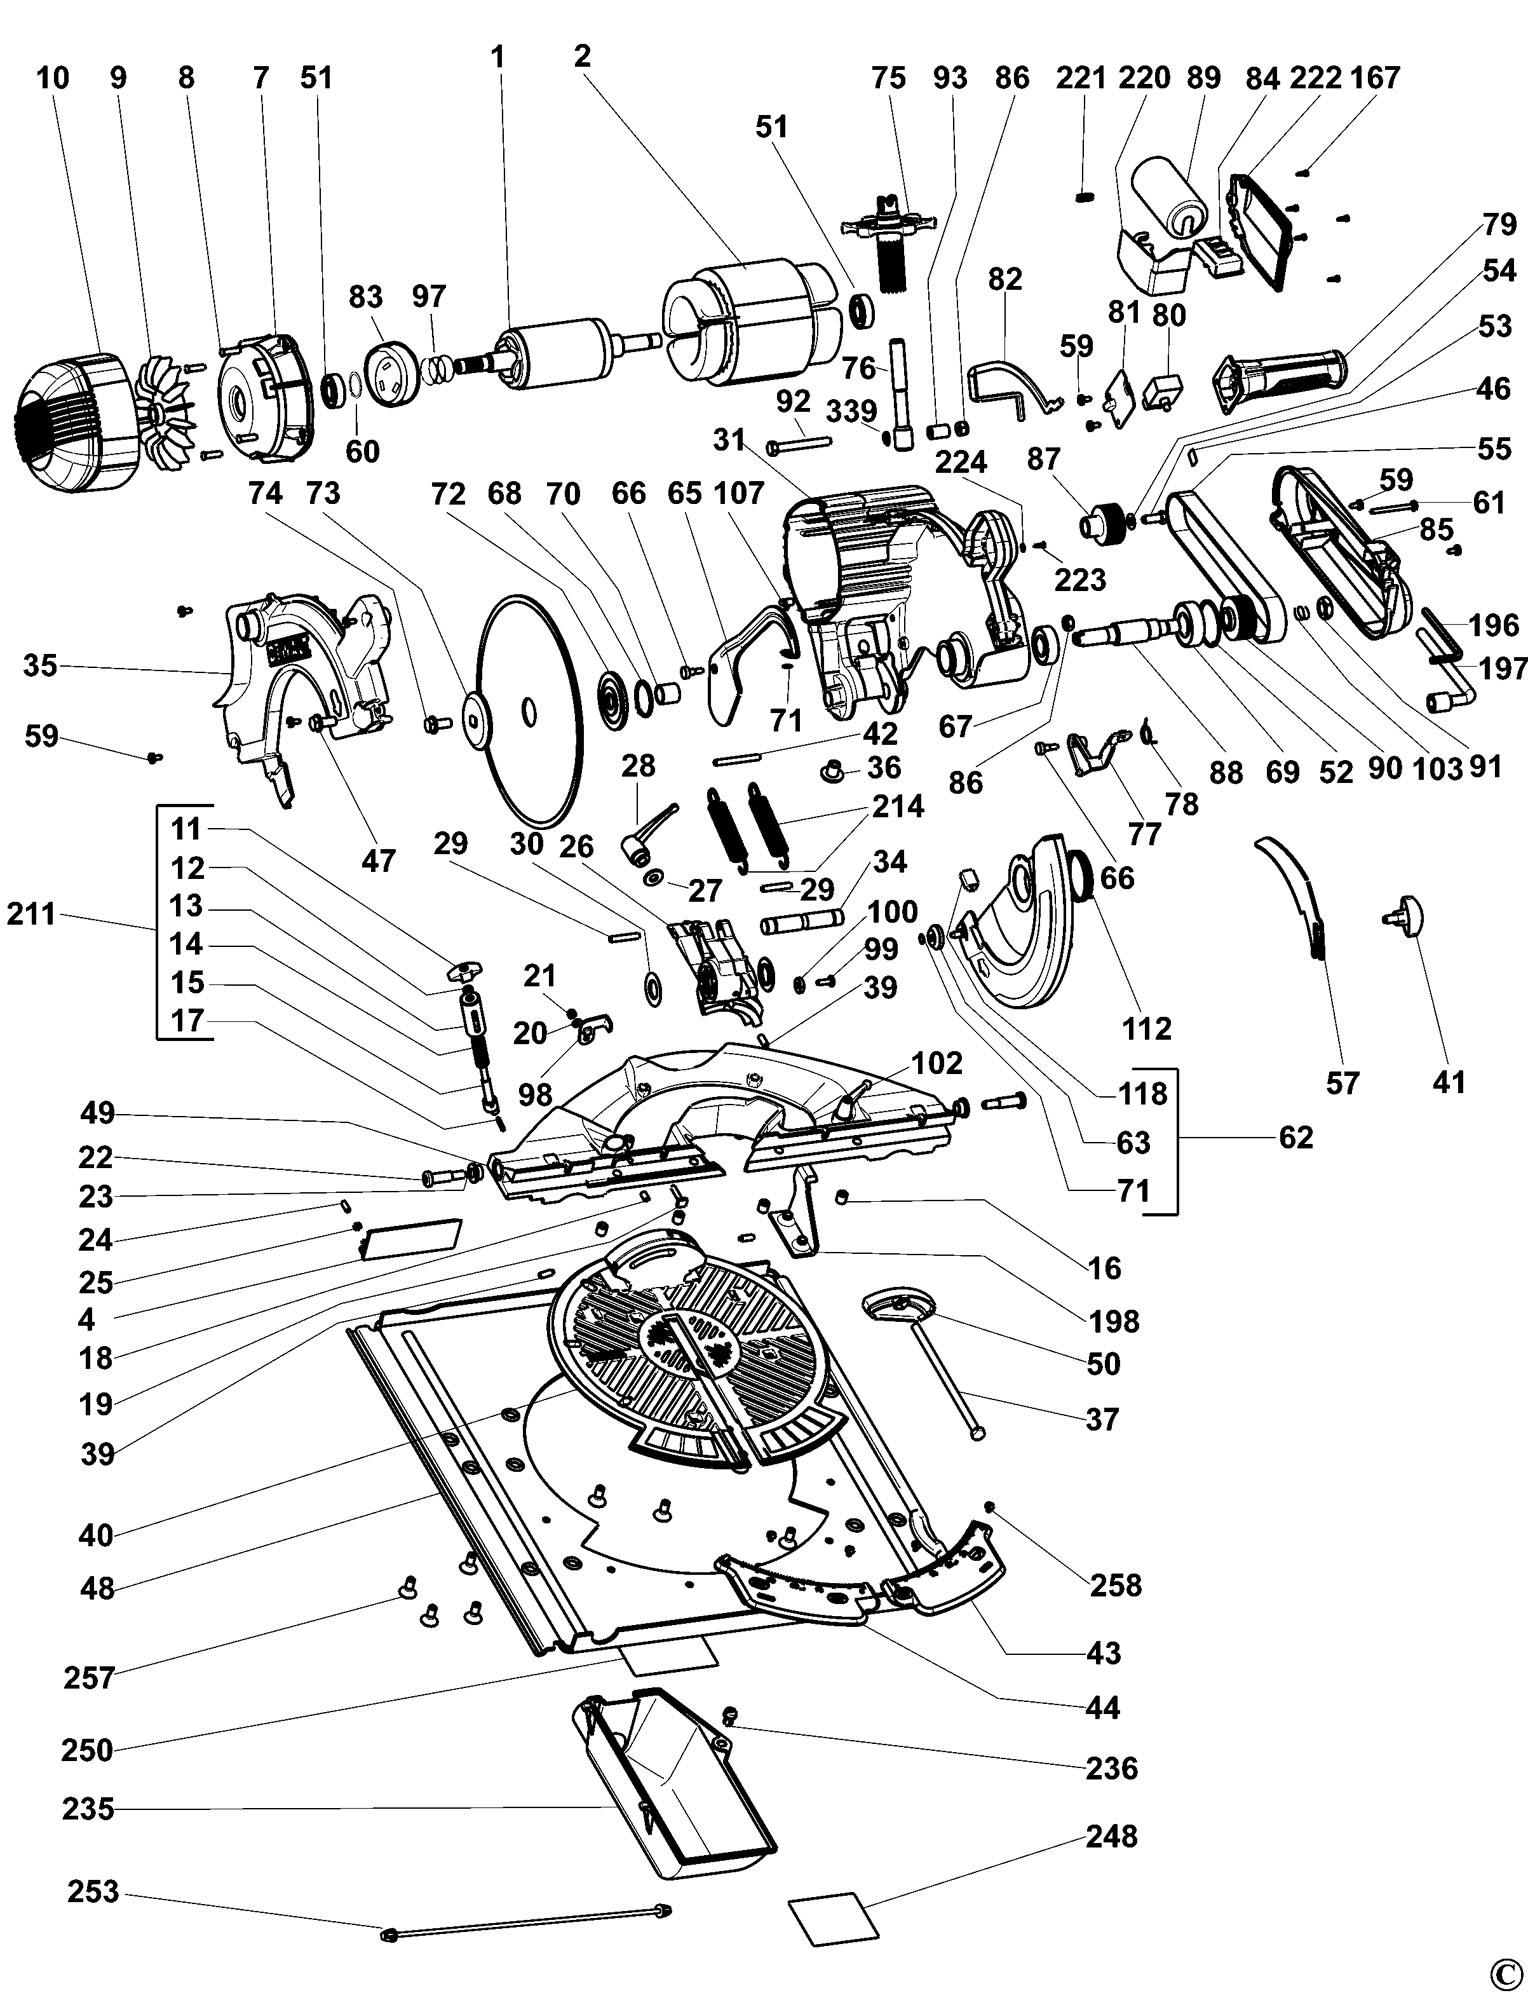 Spares For Dewalt Dw743 Combination Saw Type 6 Spare